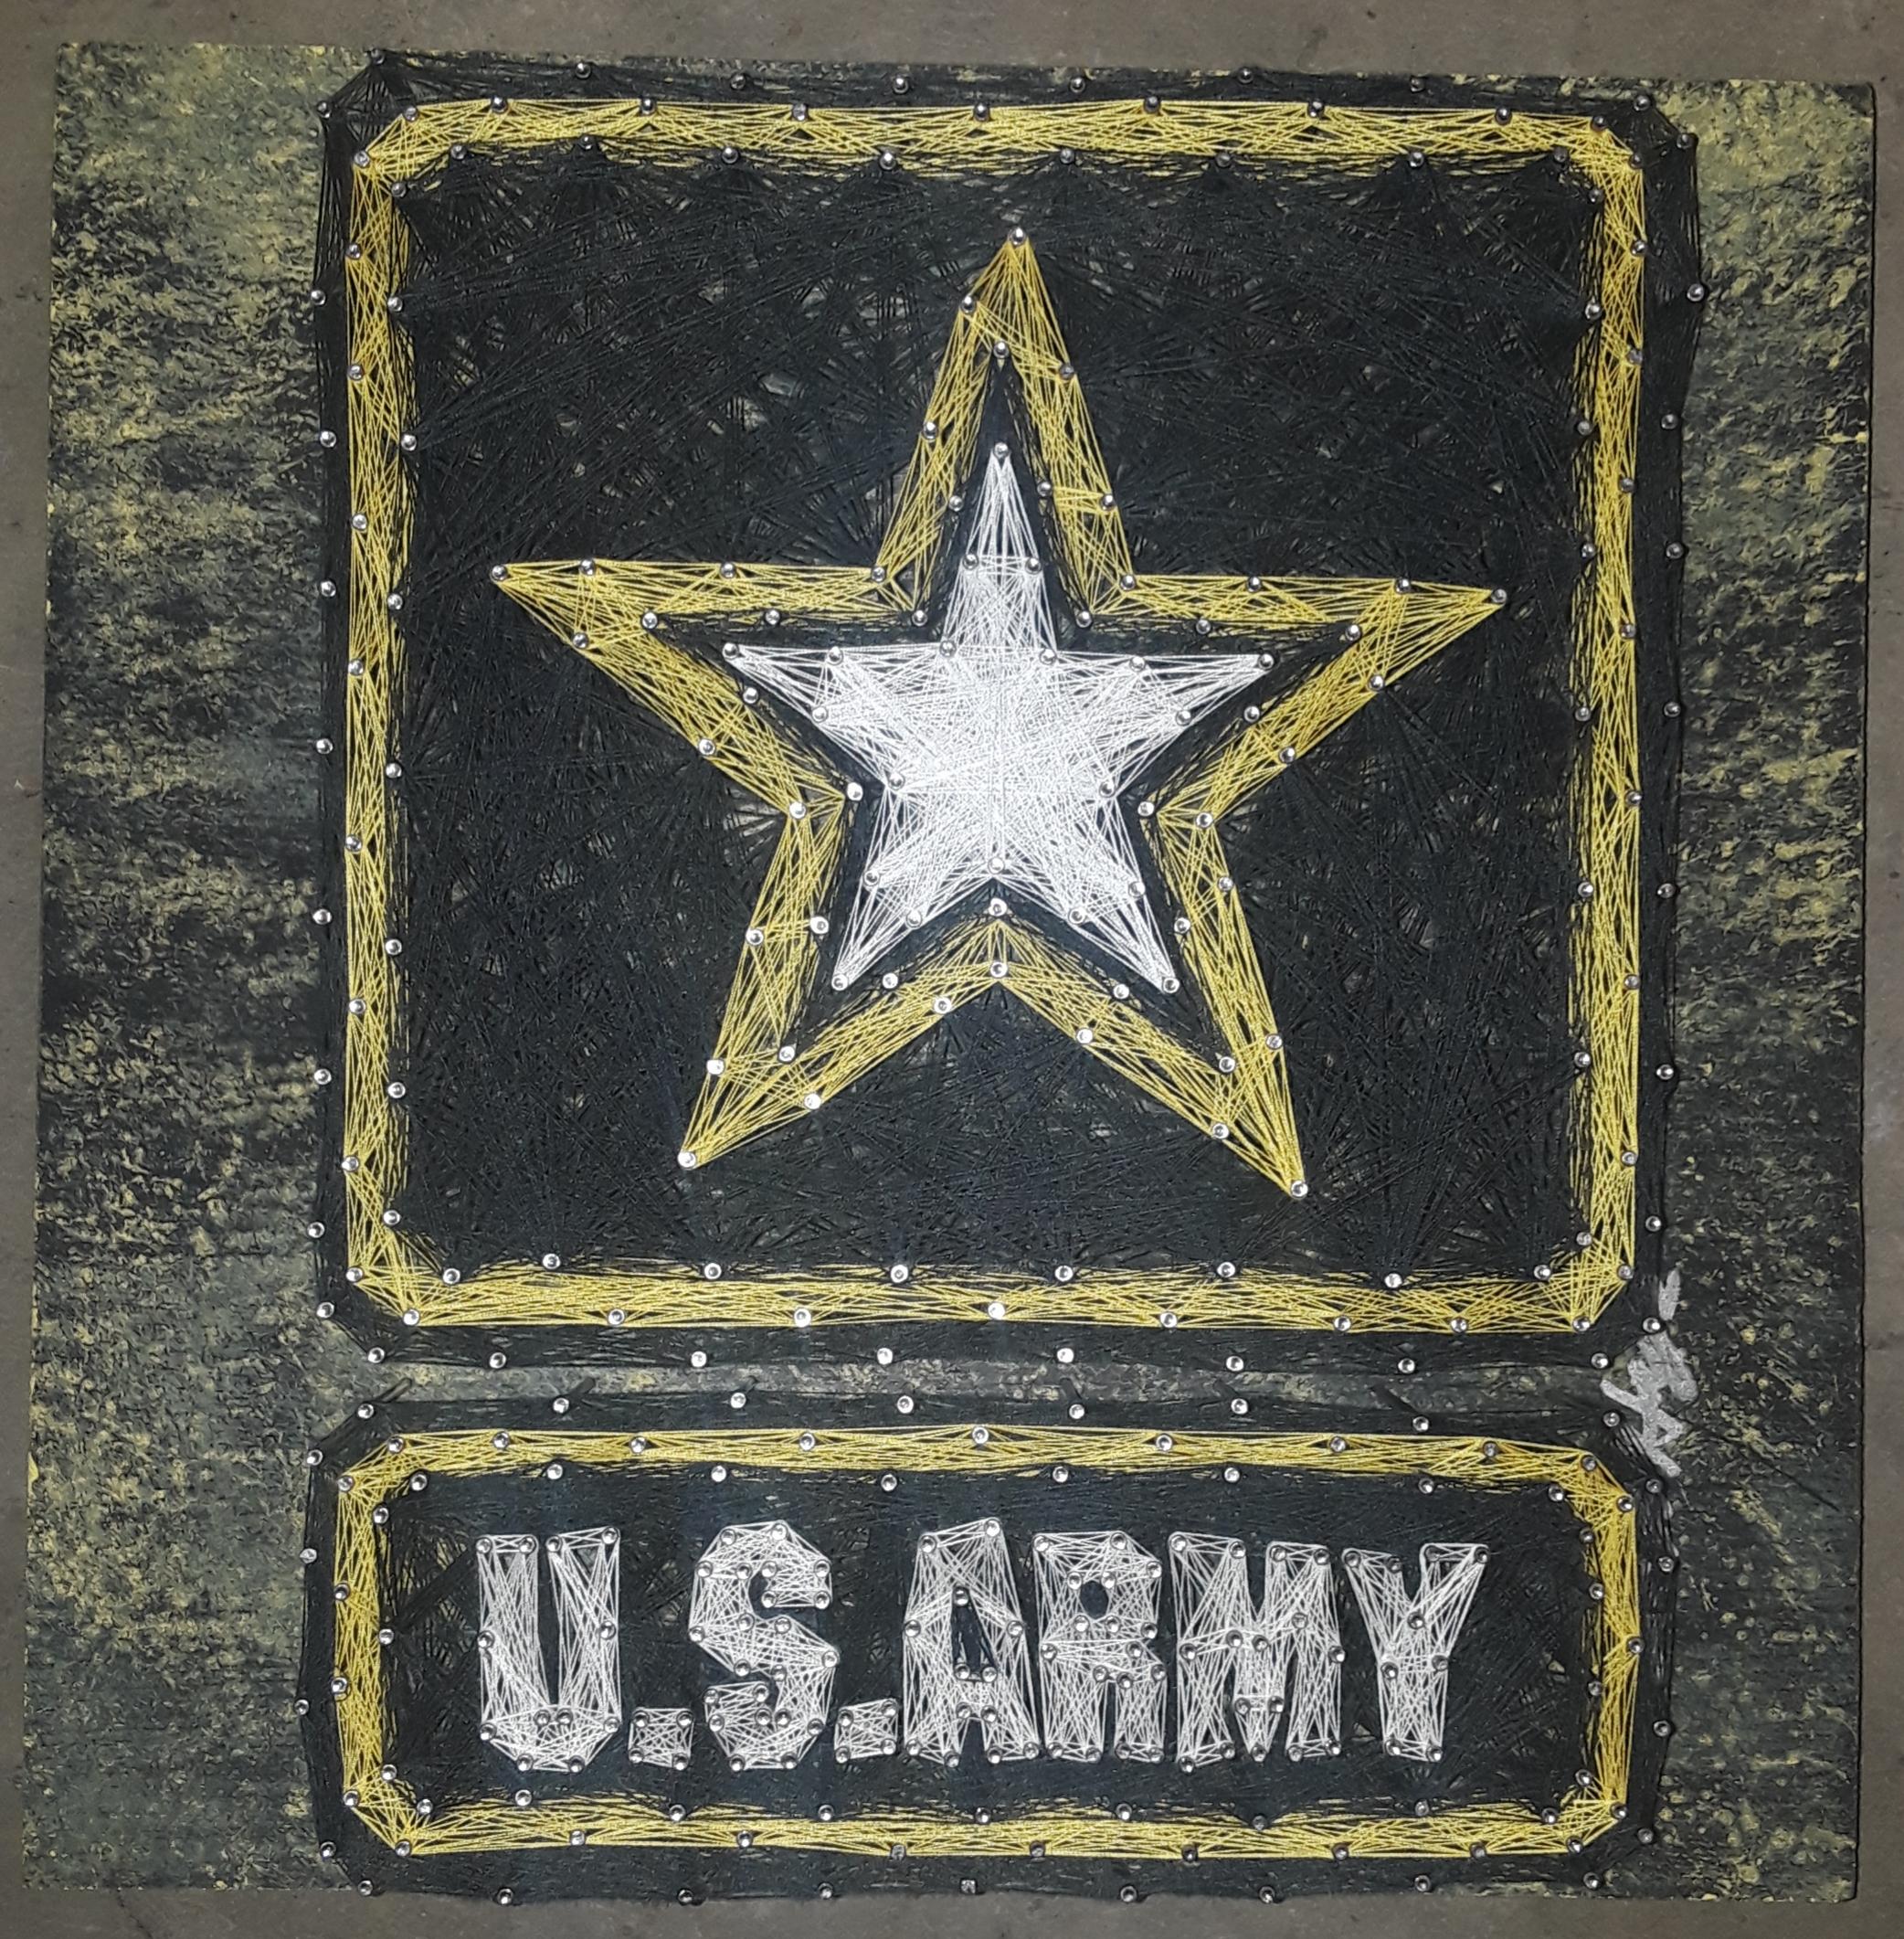 12x12 US Army